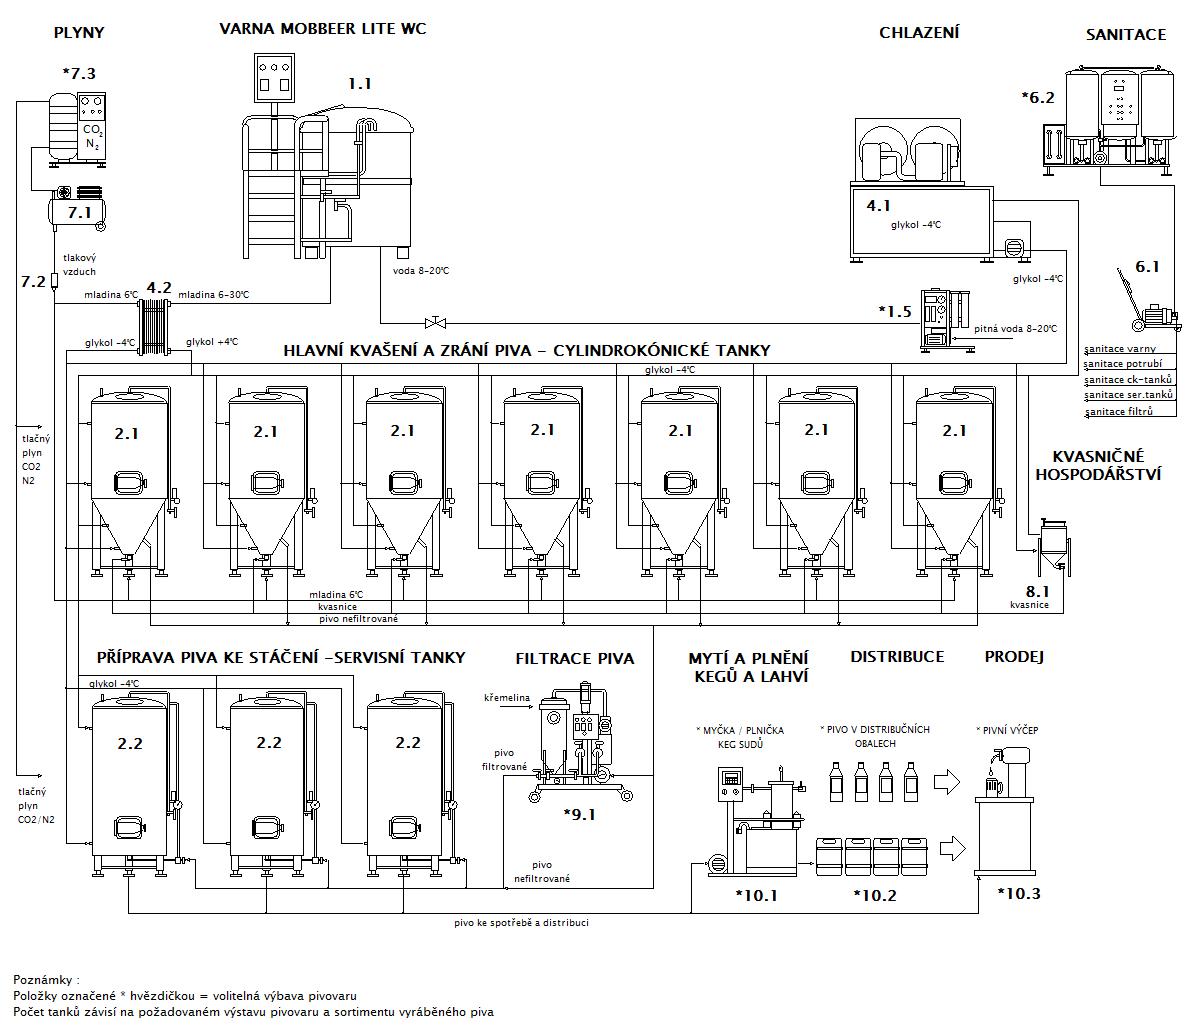 Blokové schéma minipivovaru MOBBEER LITE WC CF